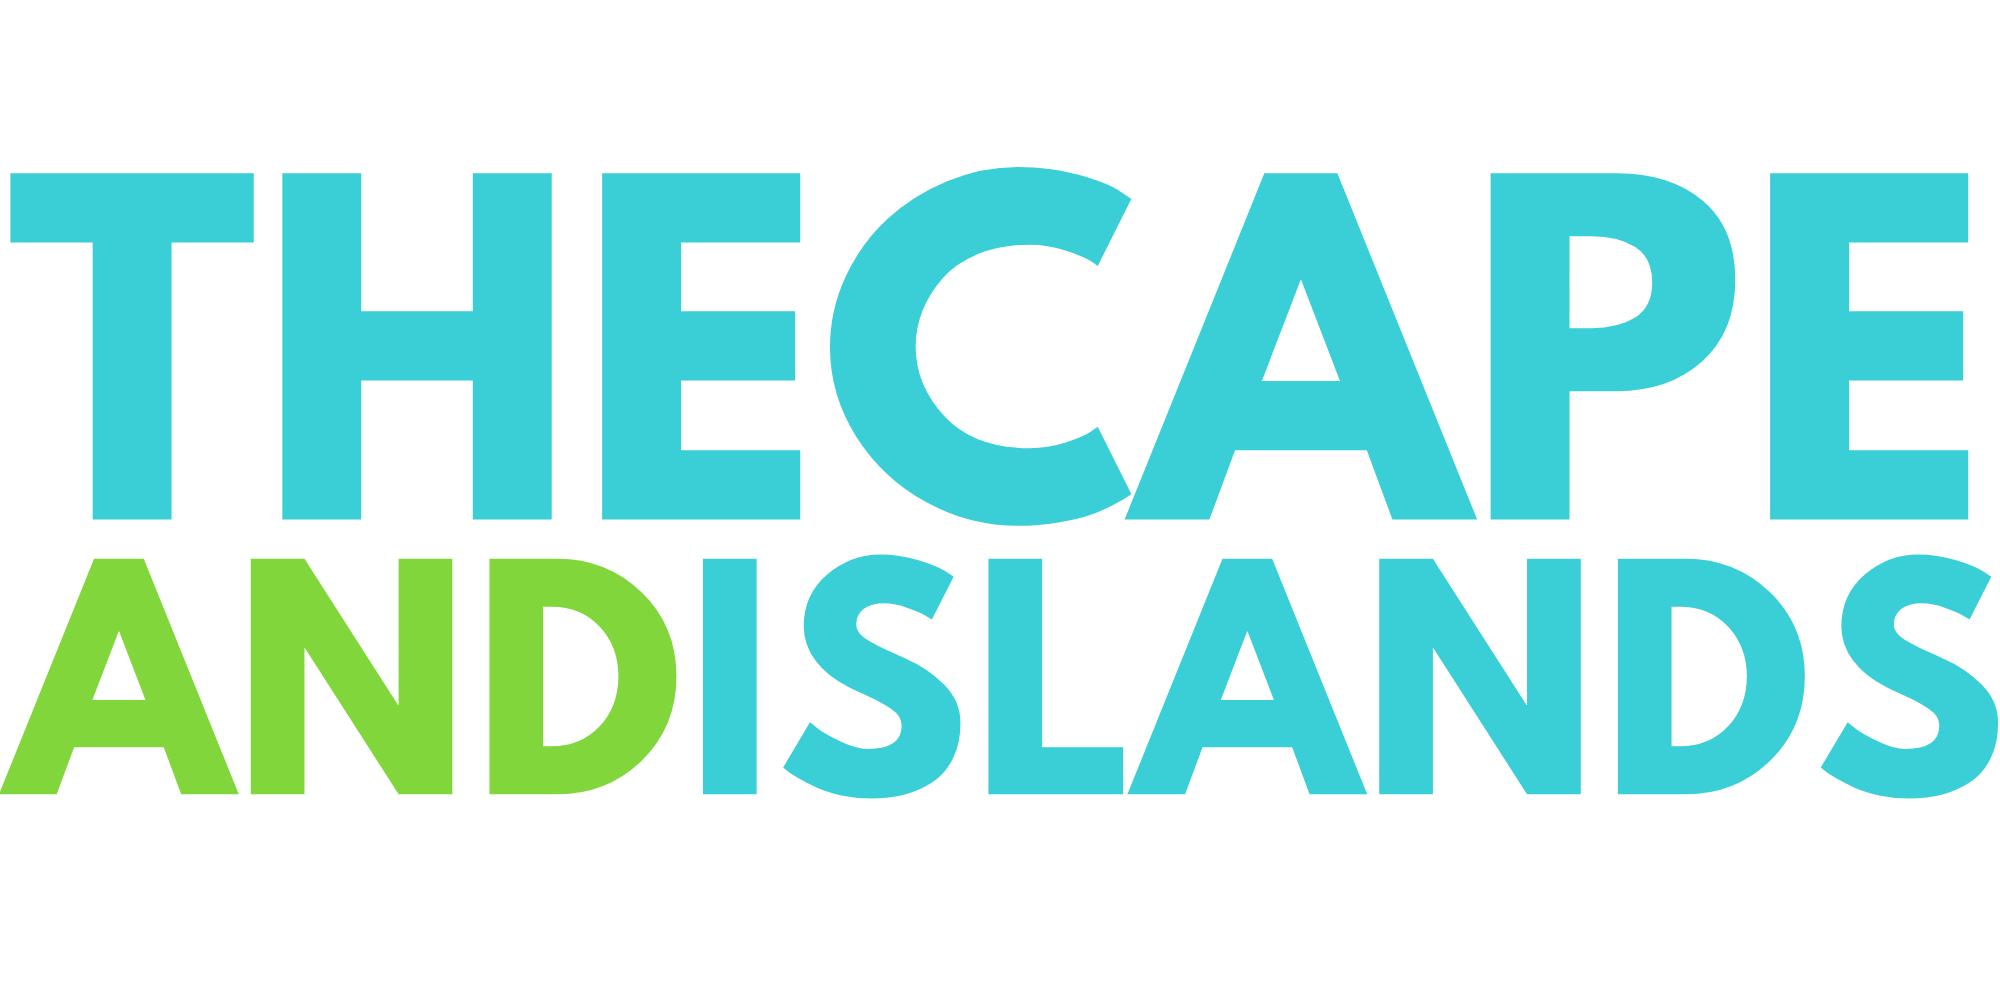 https://thecapeandislands.com/wp-content/uploads/2021/04/The-Cape-And-Islands-Logo.png